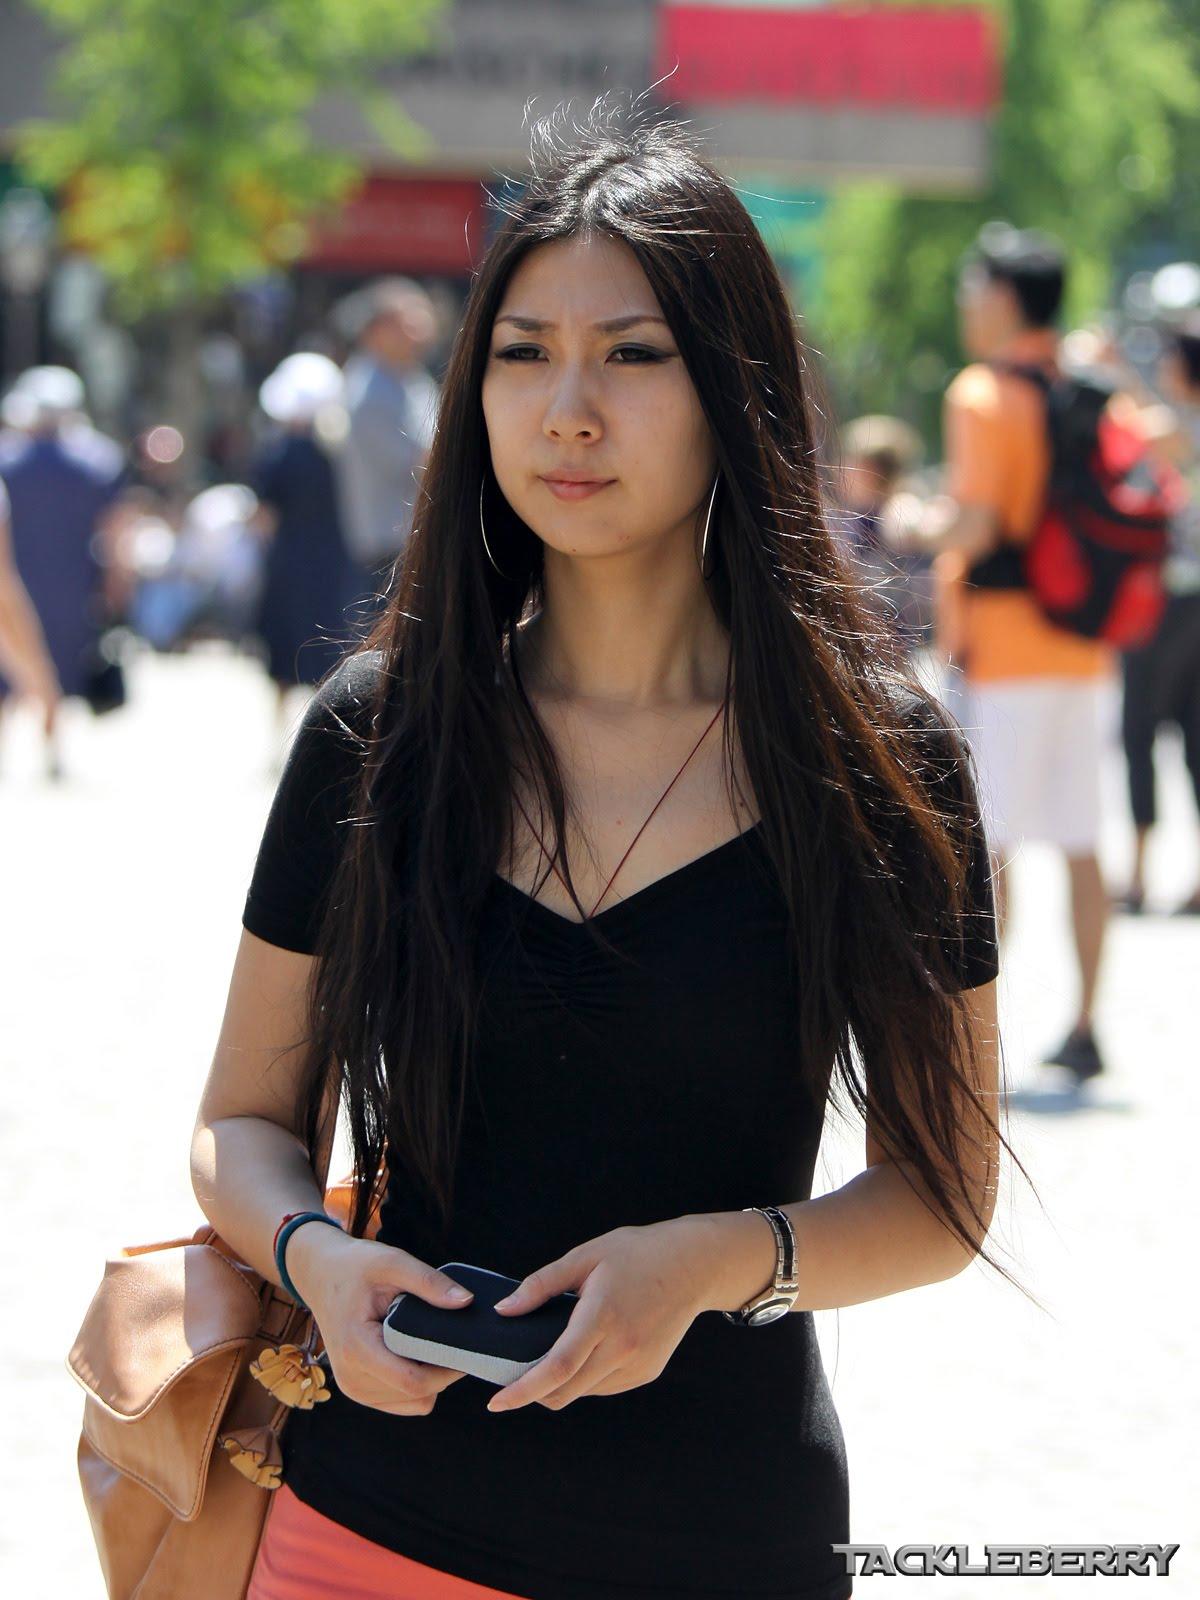 The Candid Heaven: Asian Goddess